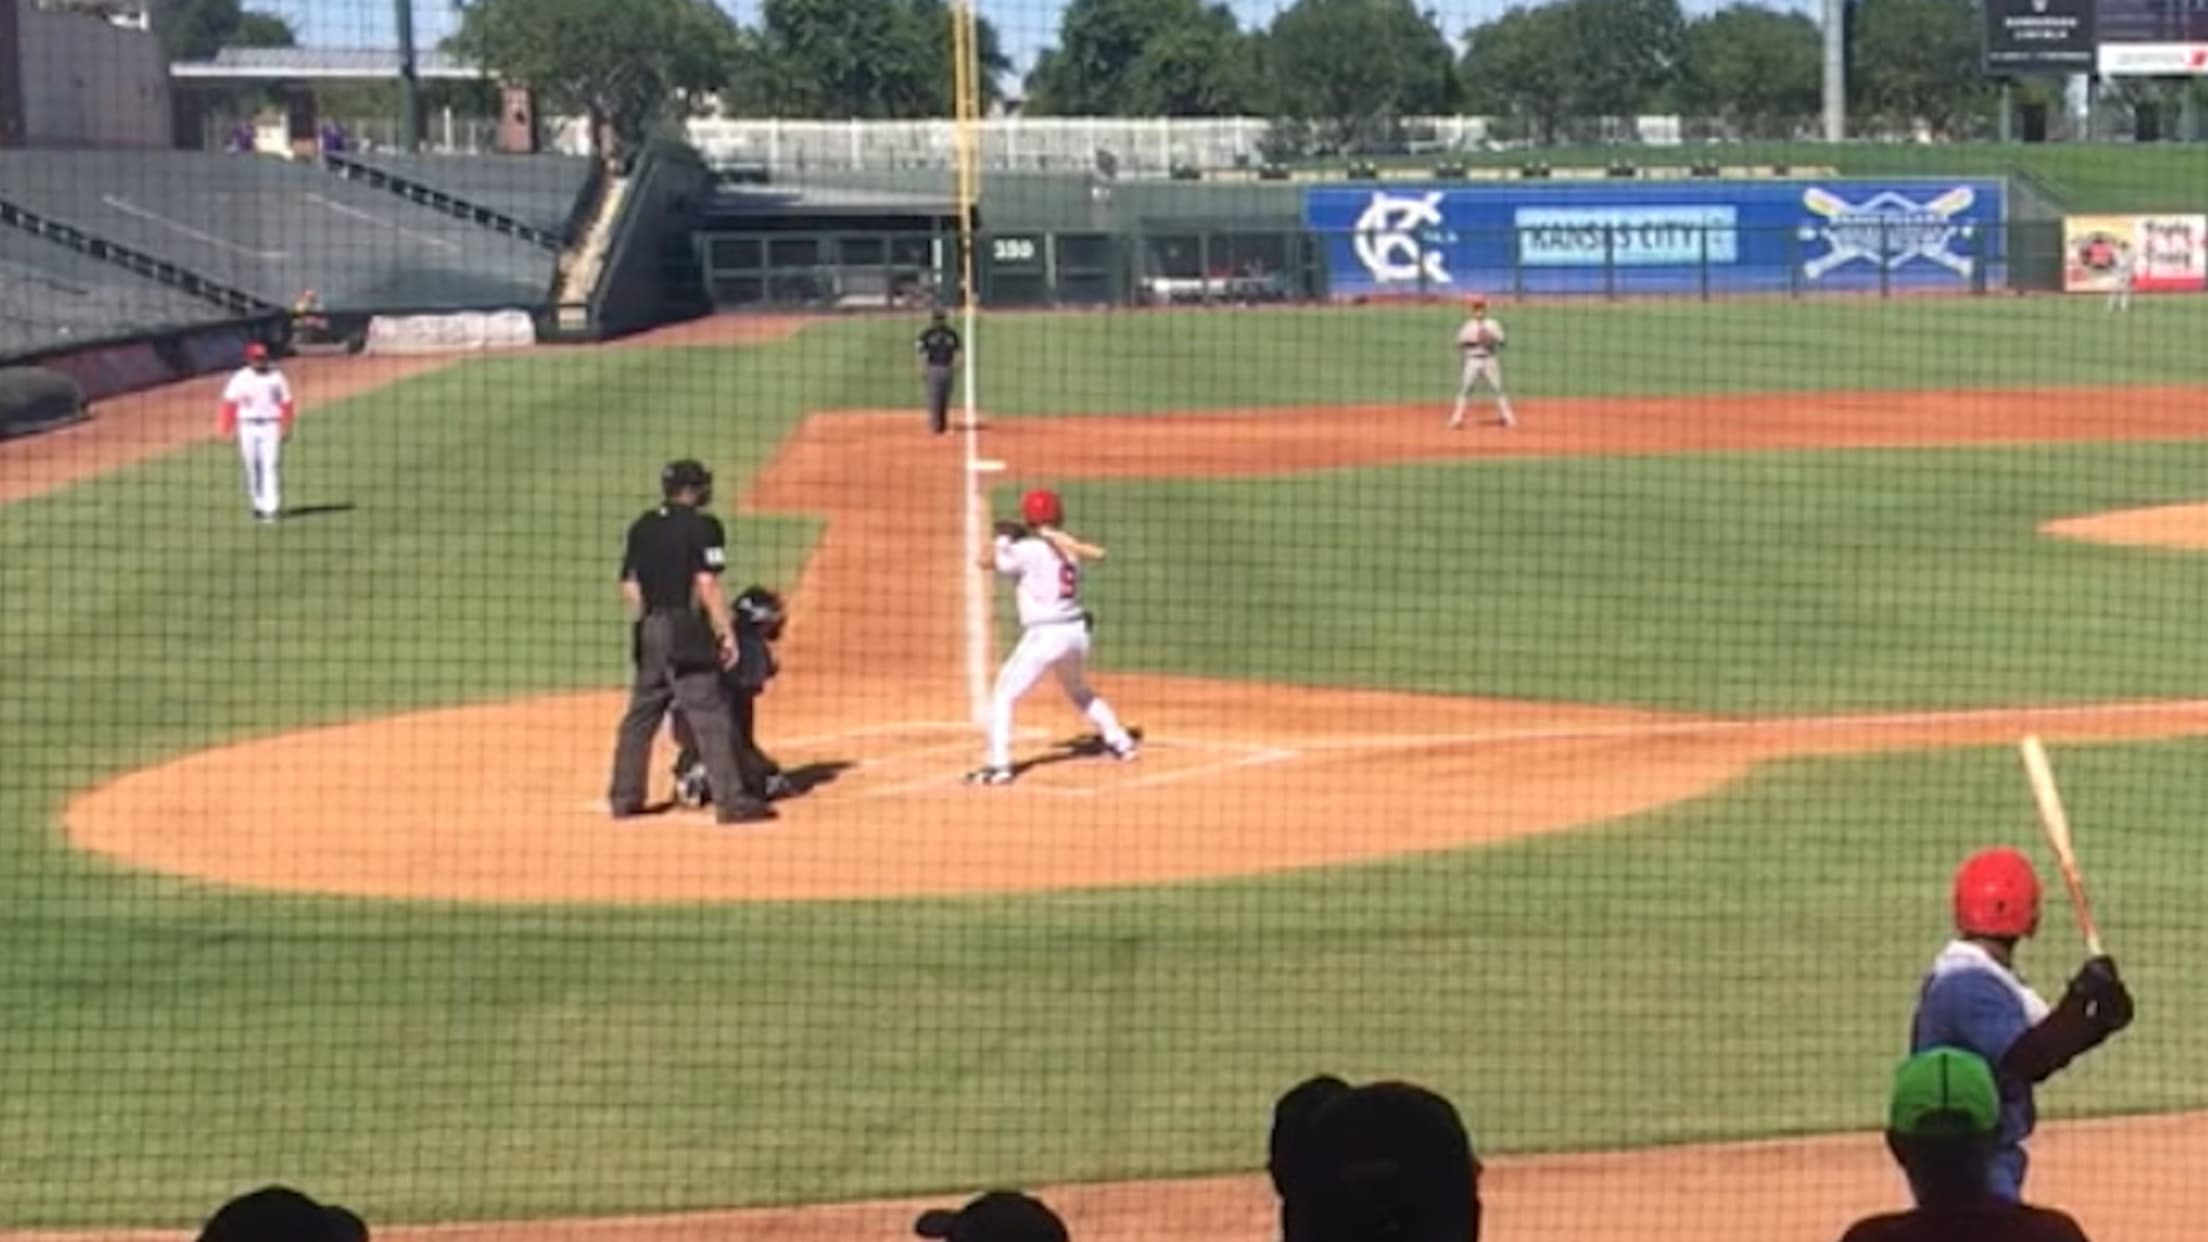 Jackson Cluff towers a home run